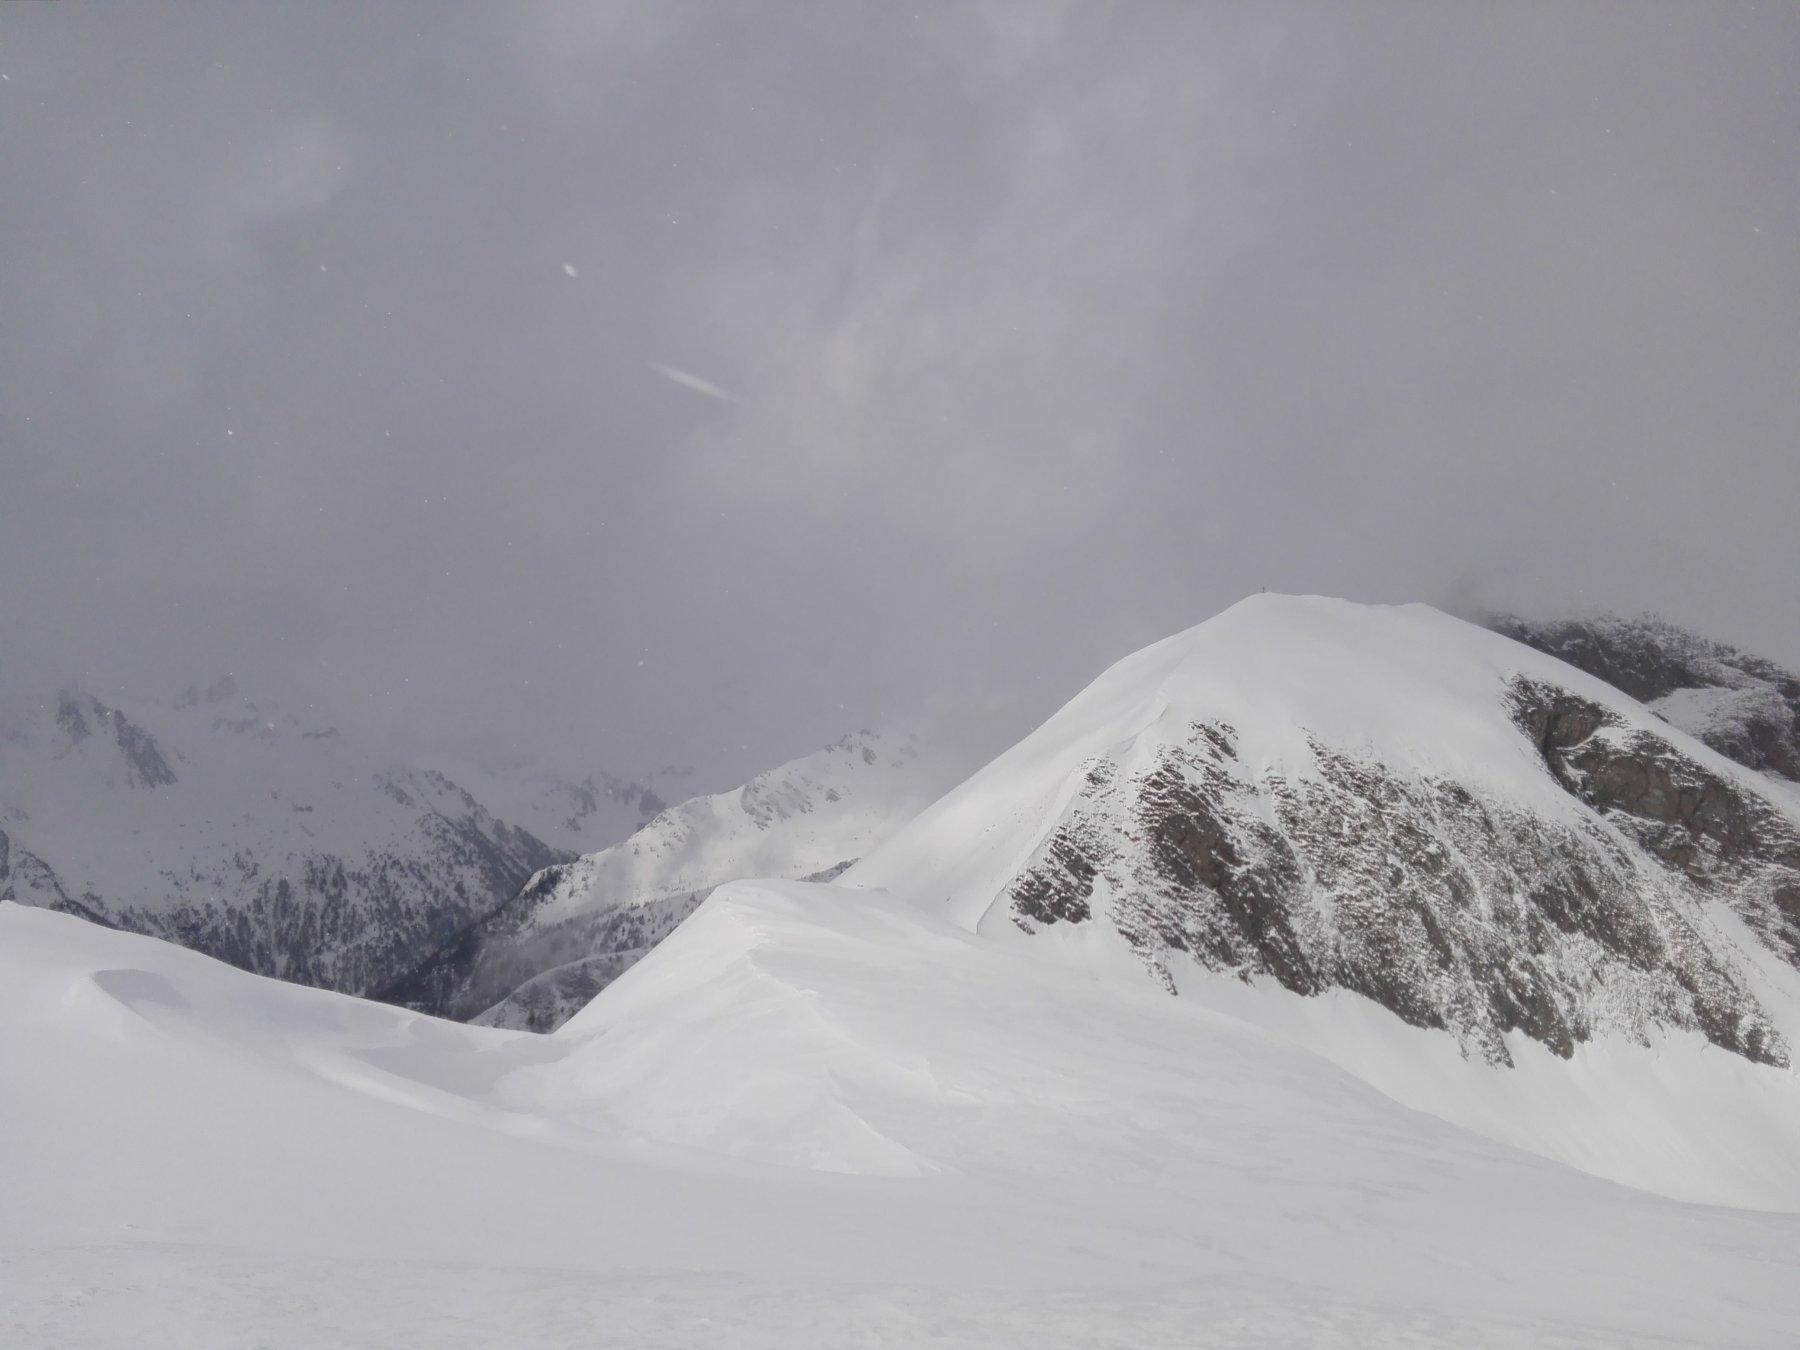 Zinsnock da Rio Bianco 2019-03-08